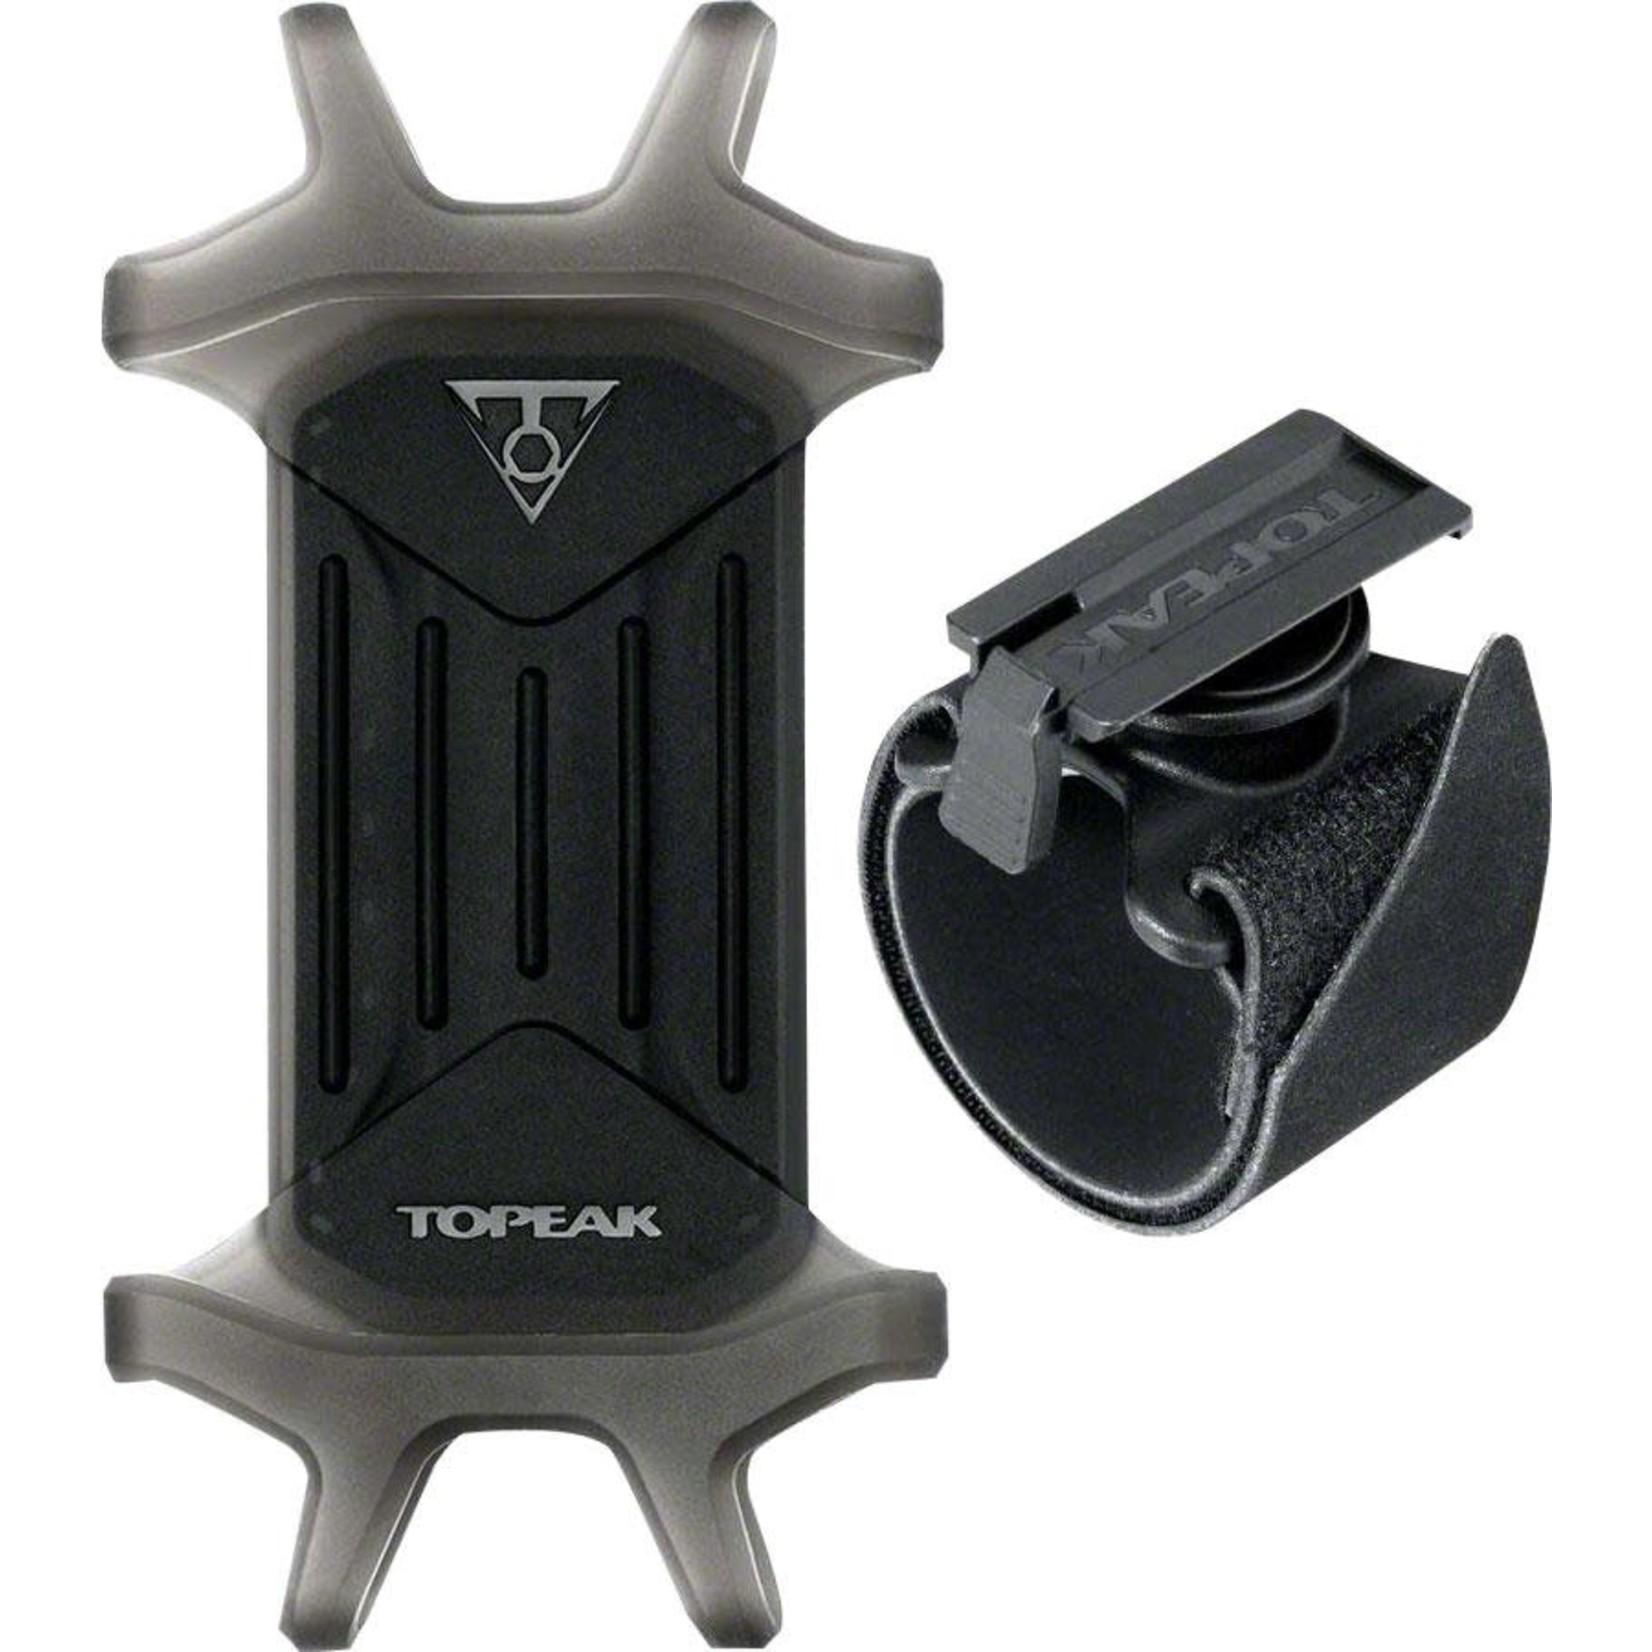 "TOPEAK Topeak Omni RideCase for 4.5"" to 5.5"" Phones with Adjustable Strap Mount"